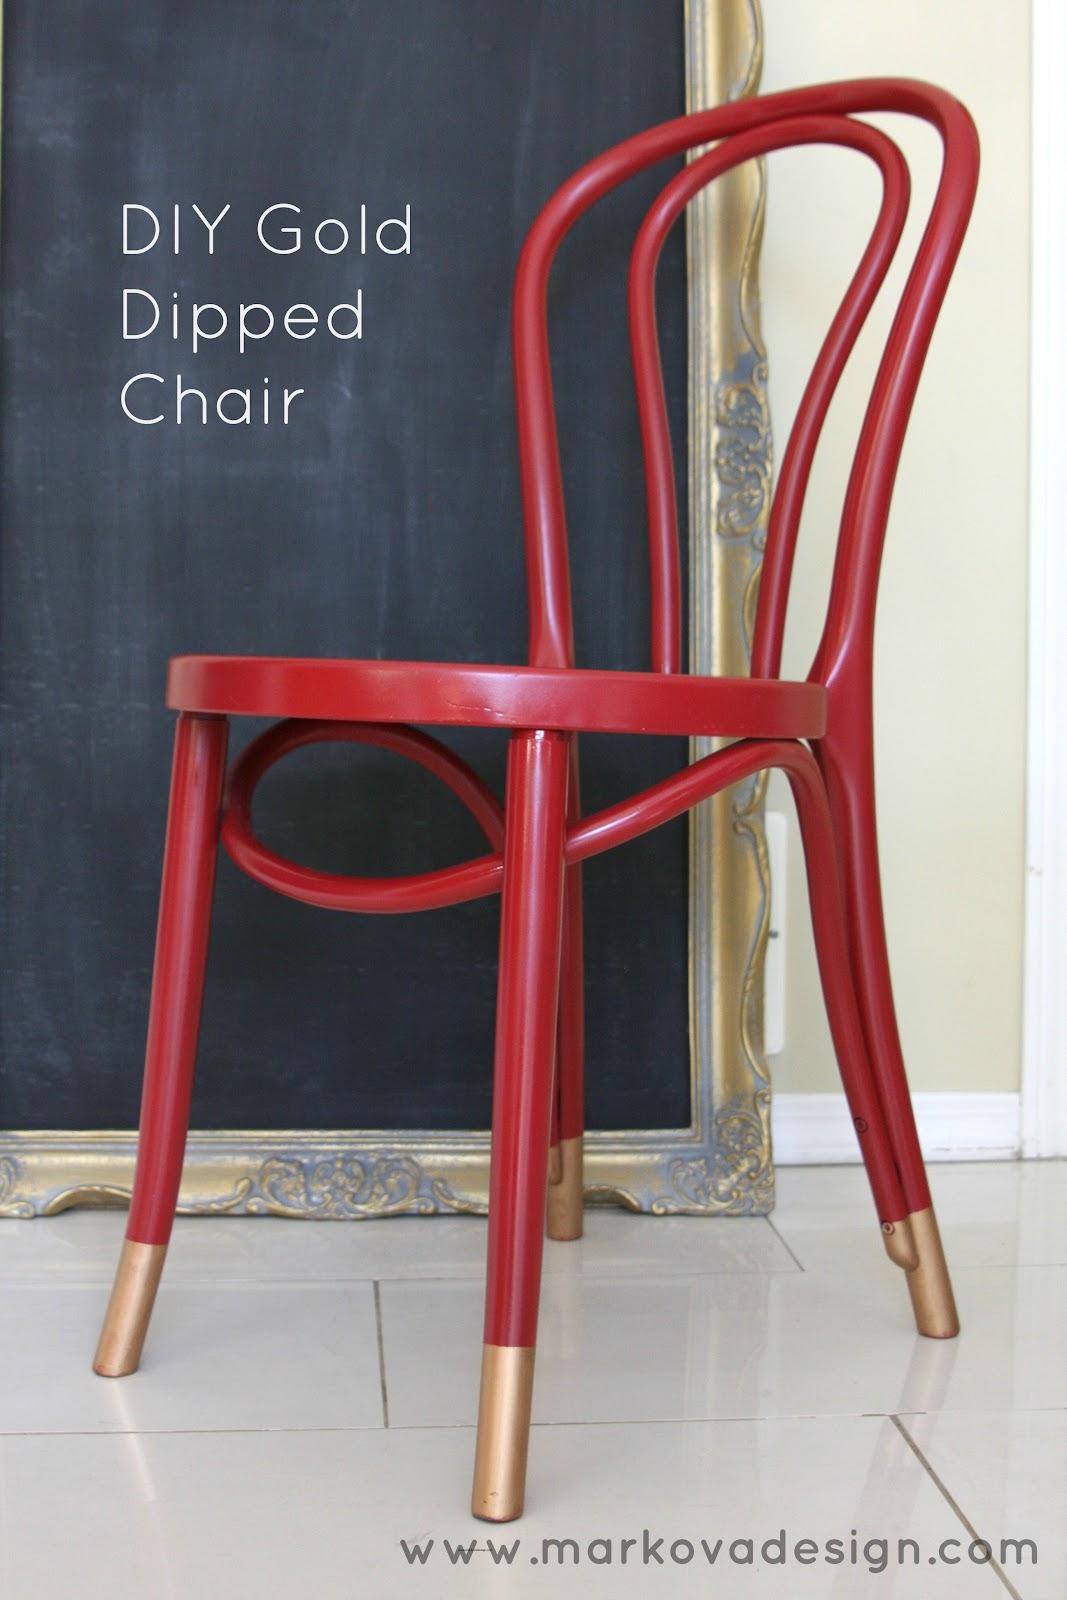 Chair Design Gold Salon Styling Chairs Canada Diy Dipped Markova